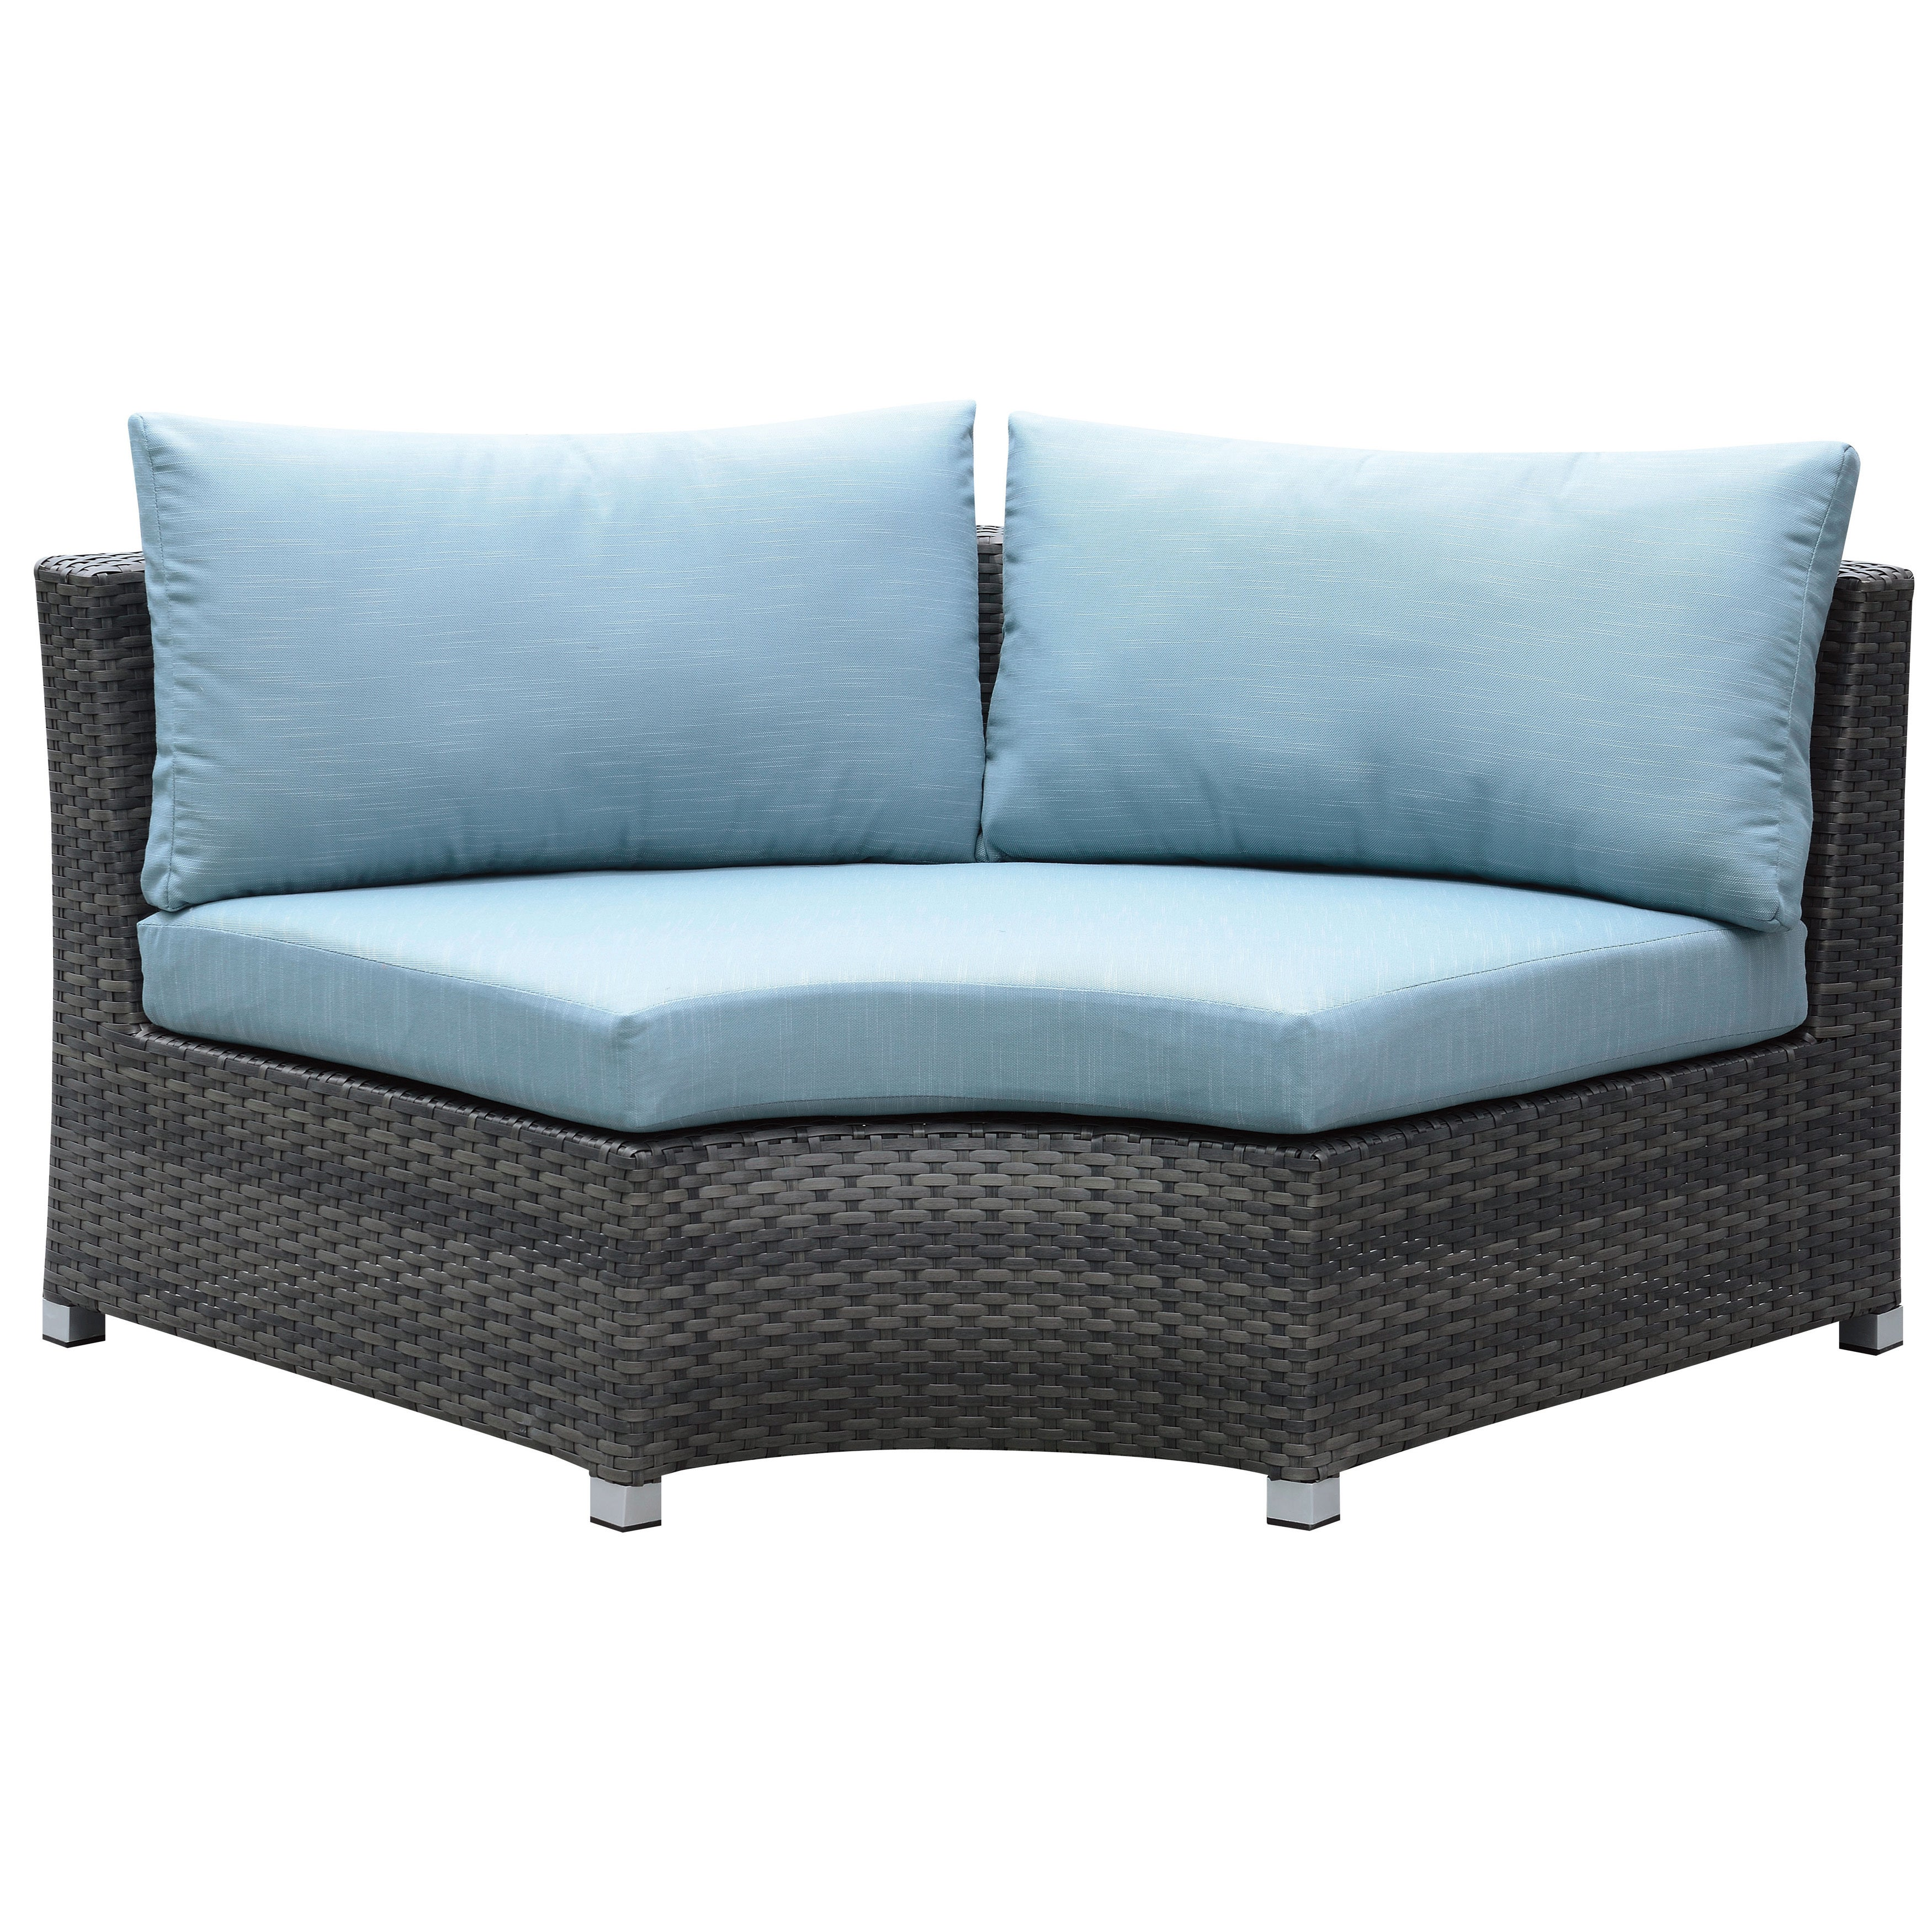 Furniture of America Griffith Modern 8 piece Dark Grey Modular